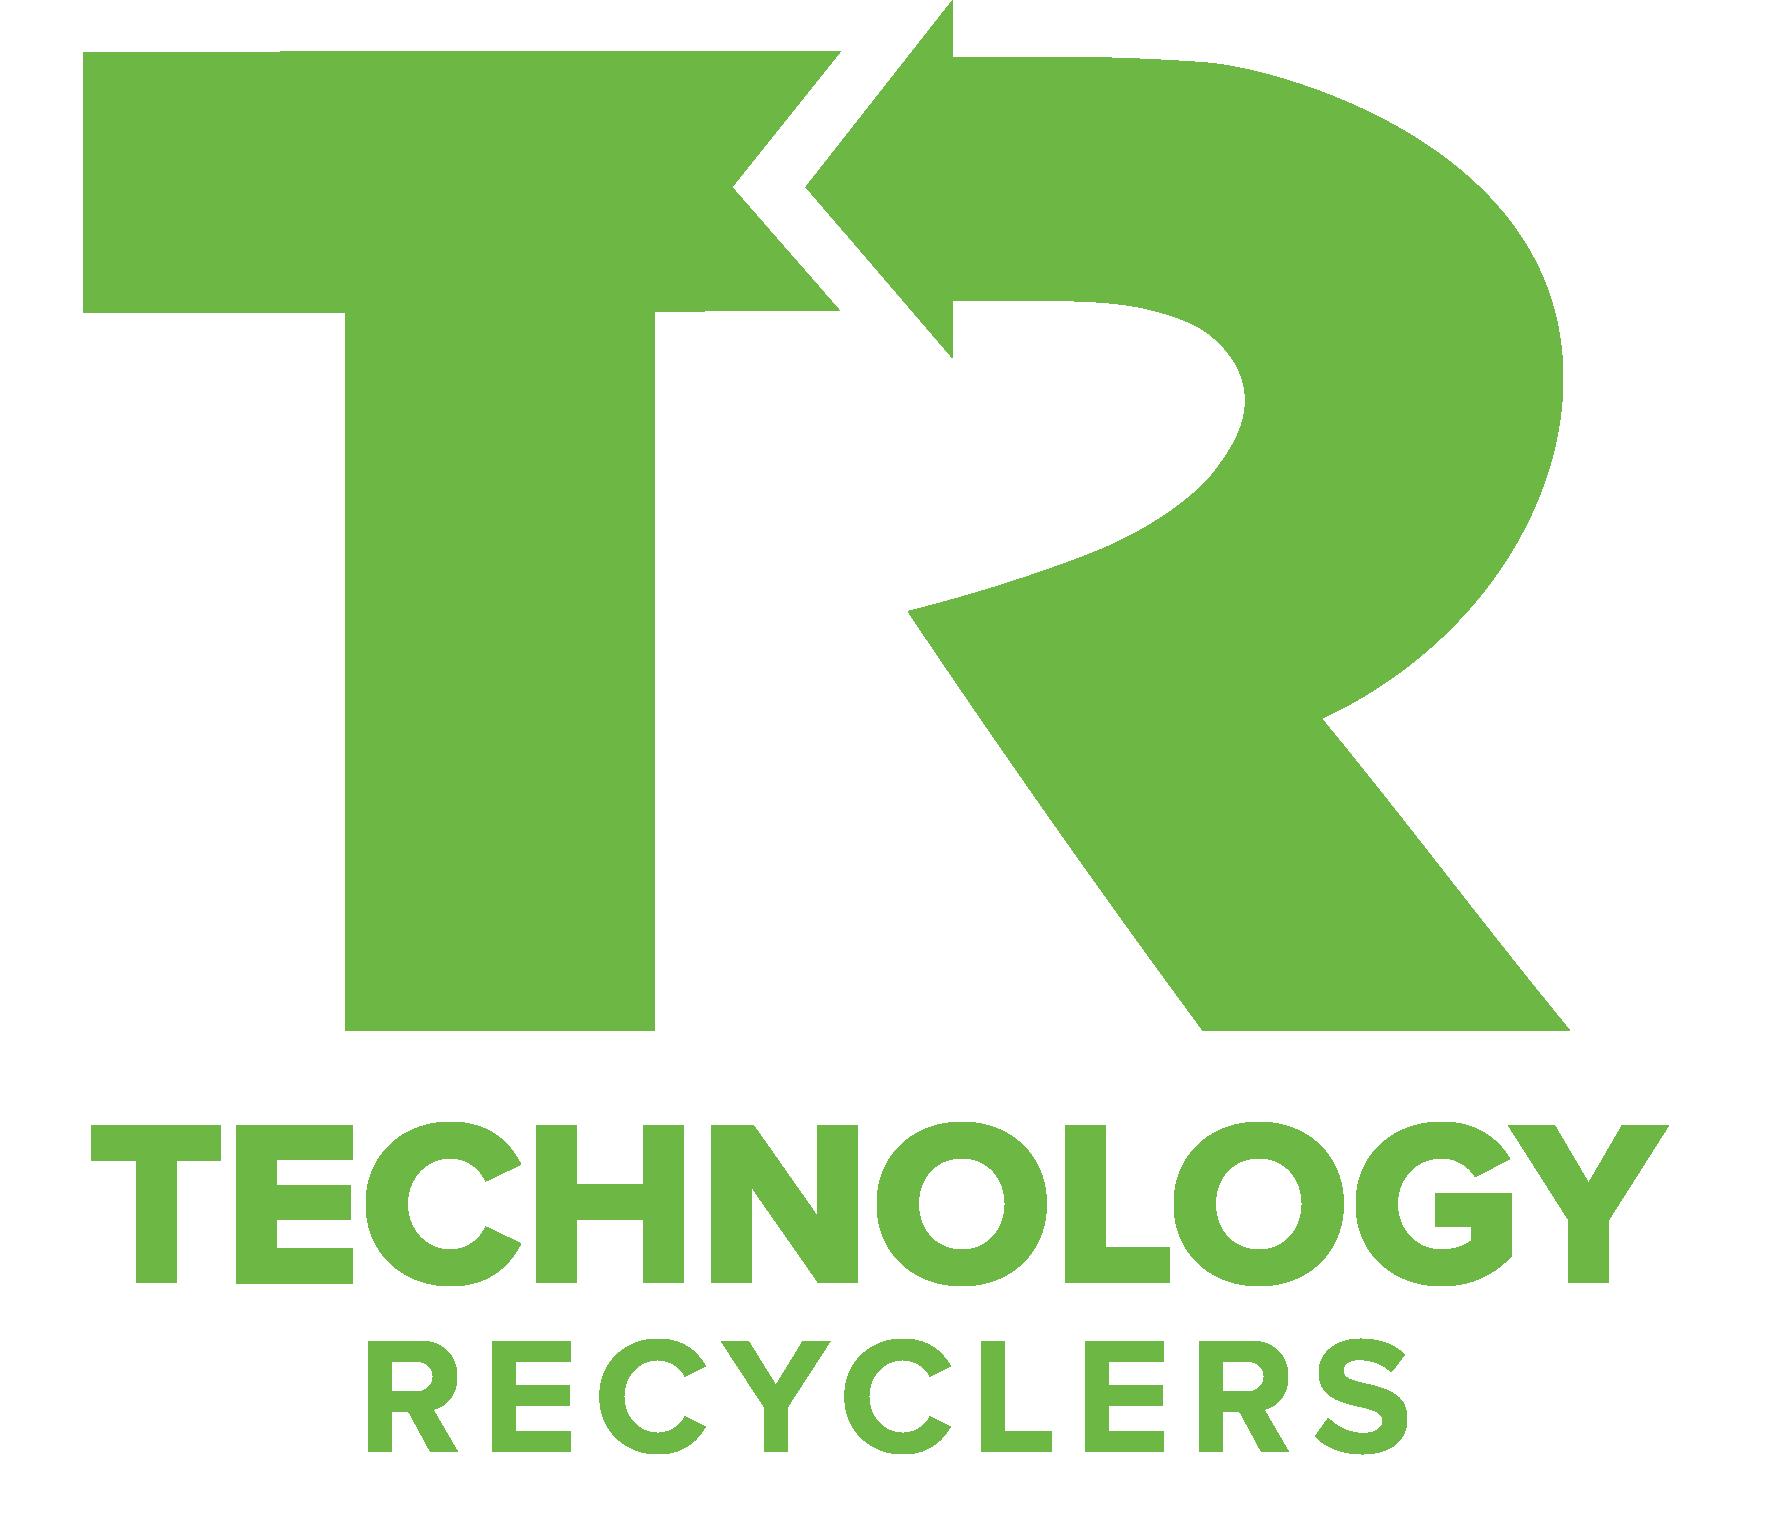 TechRecyclersNewLogo-GRN